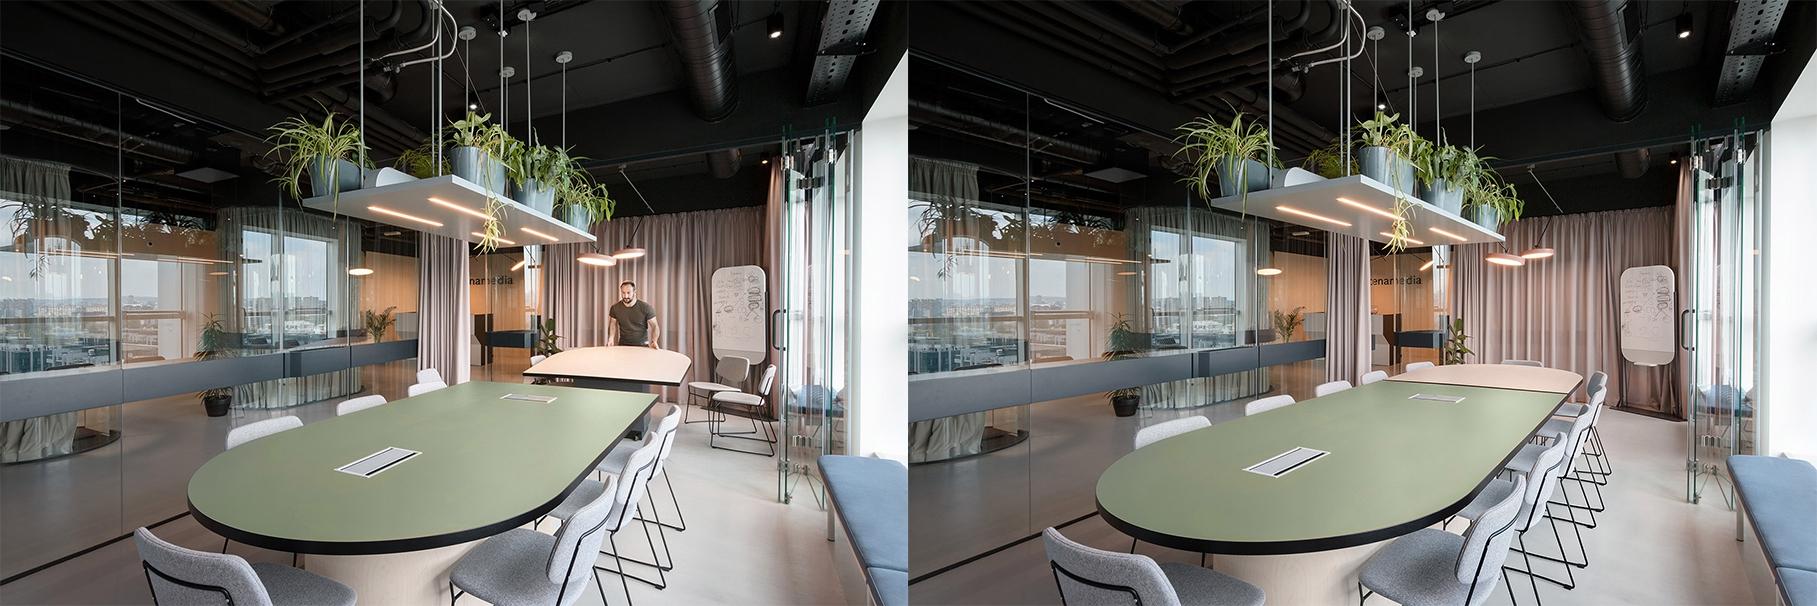 11-Belgrade-office-by-Studio-AUTORI_016